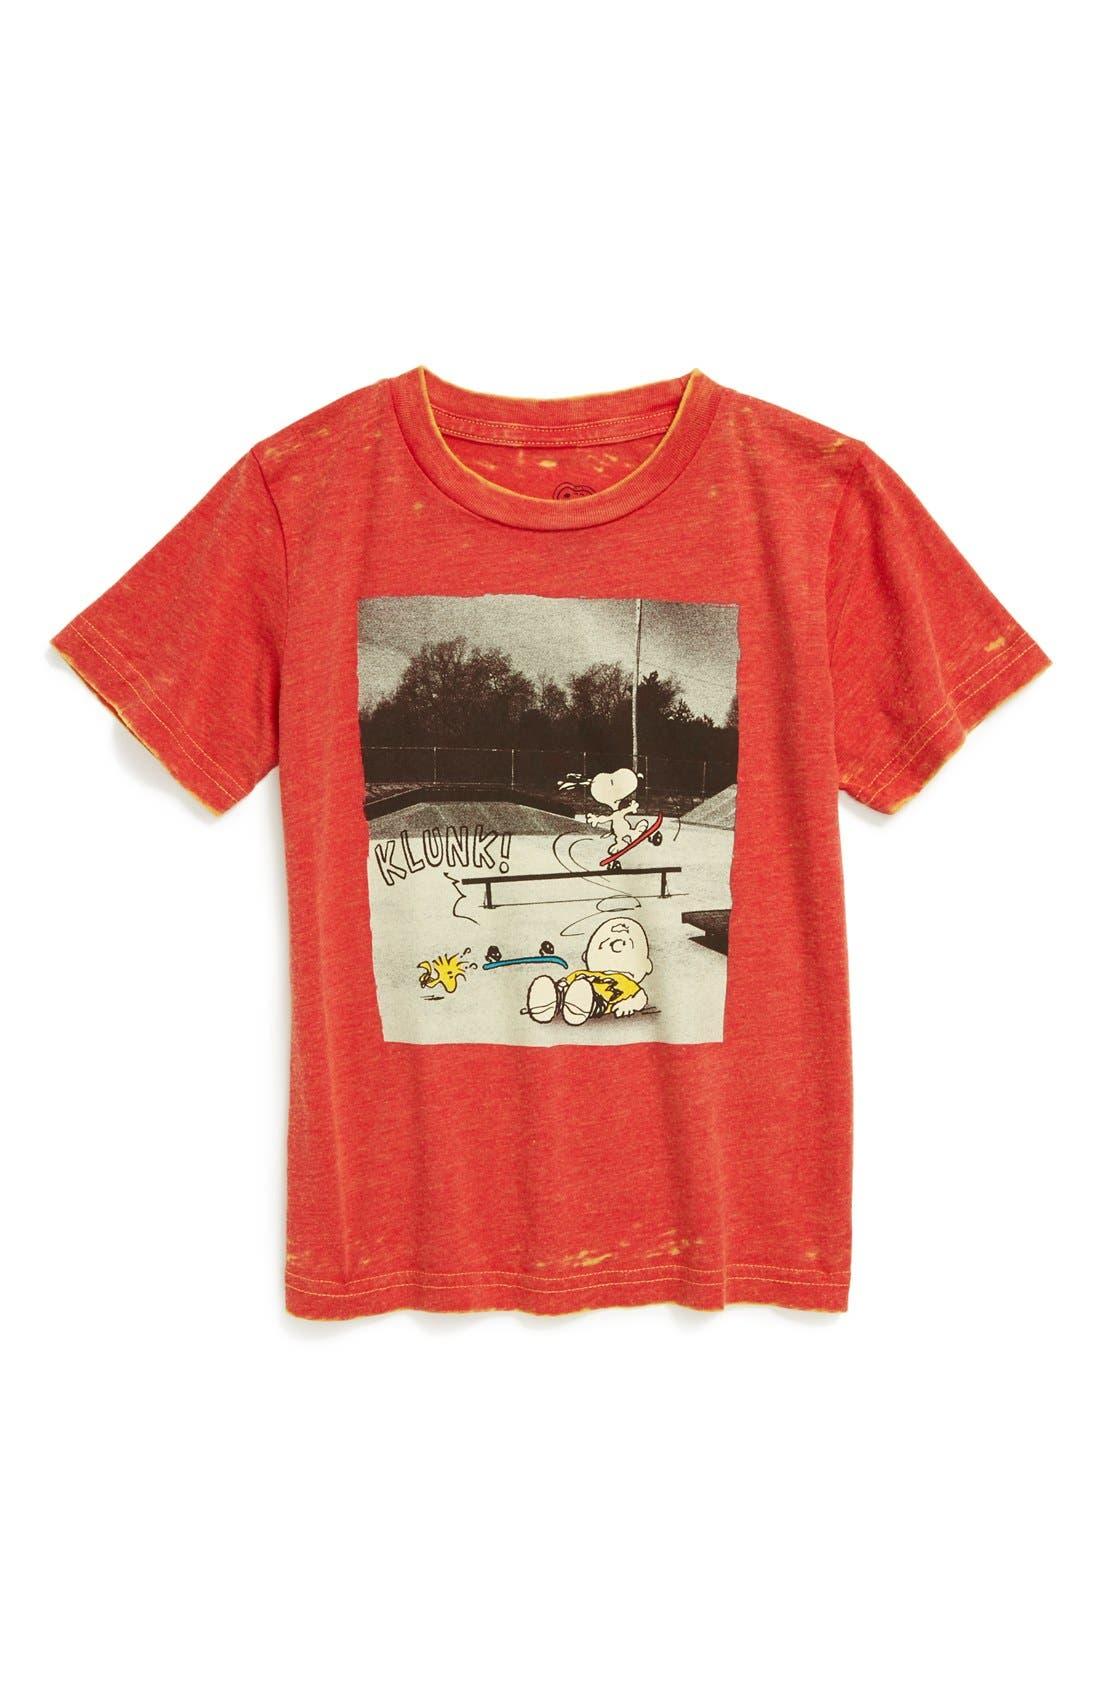 Alternate Image 1 Selected - Jem 'Charlie Brown™' Graphic T-Shirt (Toddler Boys)